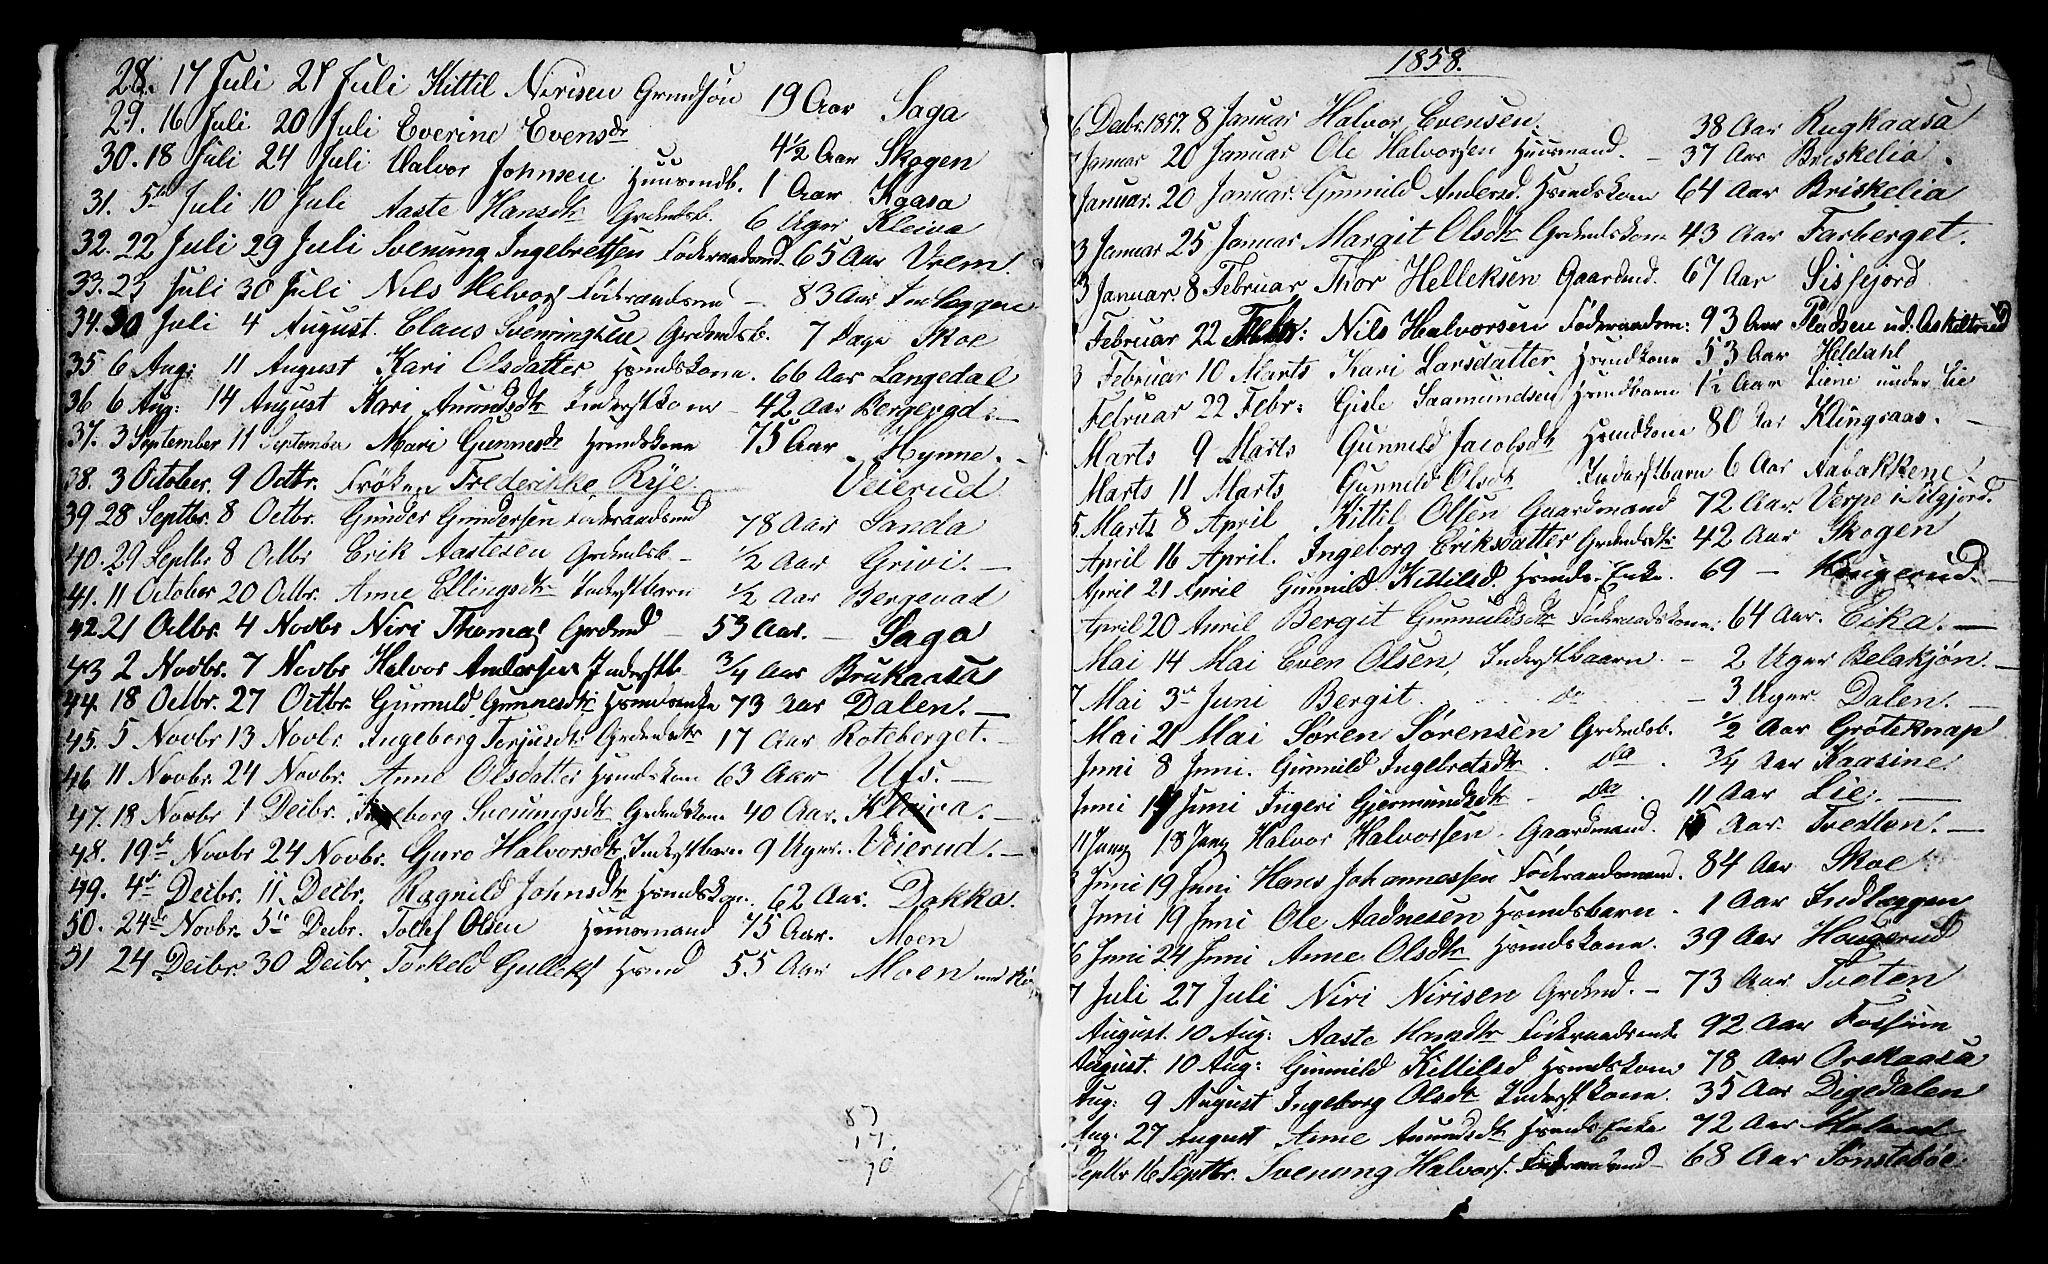 SAKO, Bø kirkebøker, G/Ga/L0002: Klokkerbok nr. 2, 1853-1866, s. 5